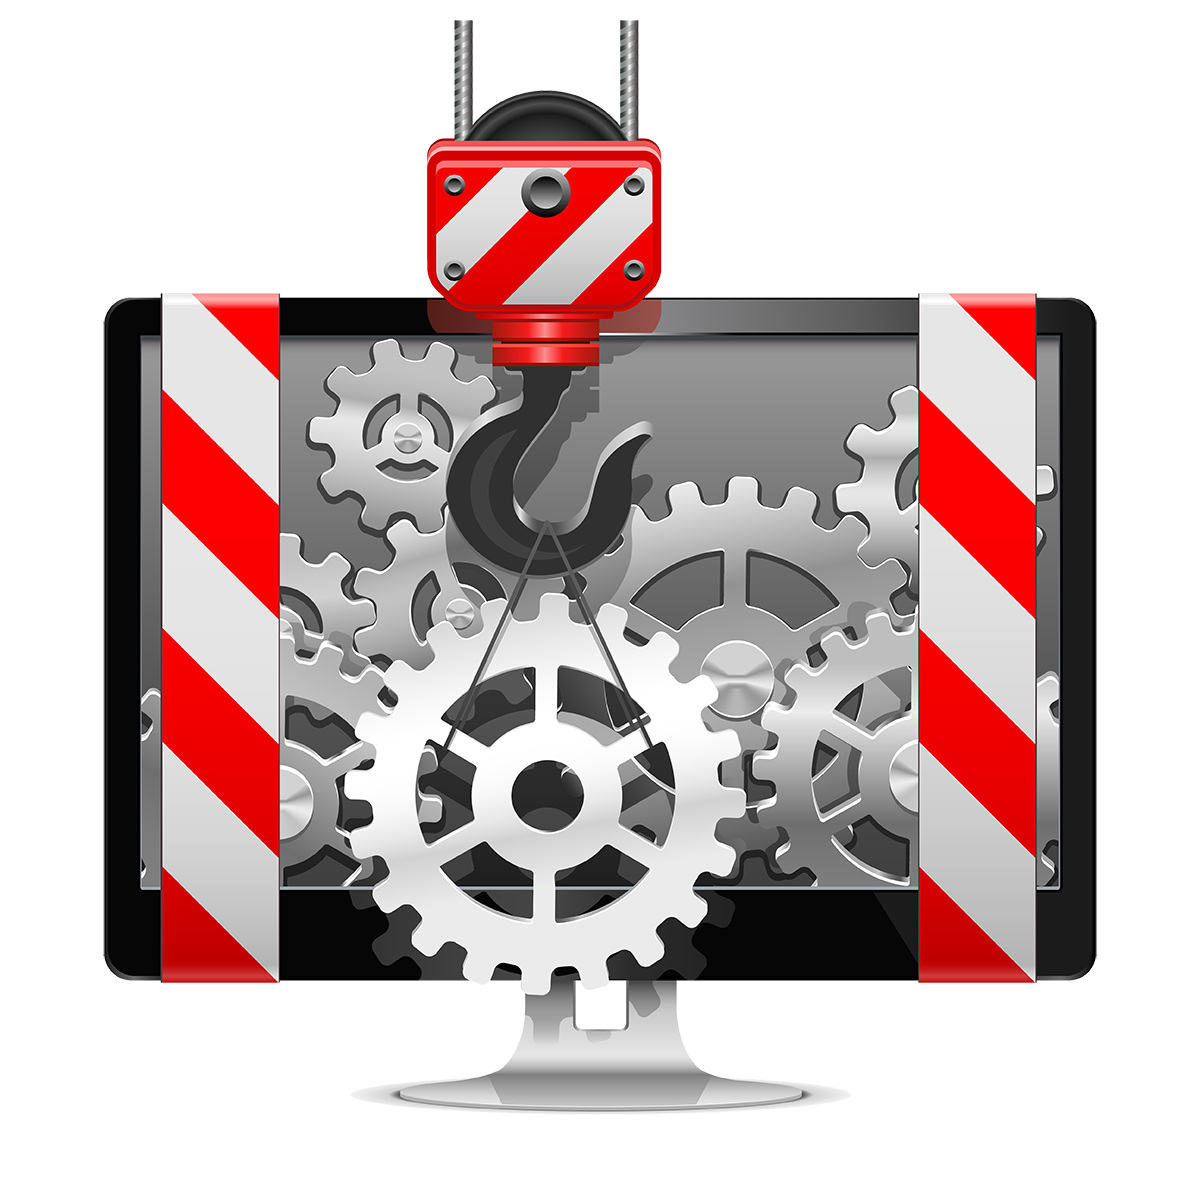 Web-Baustelle